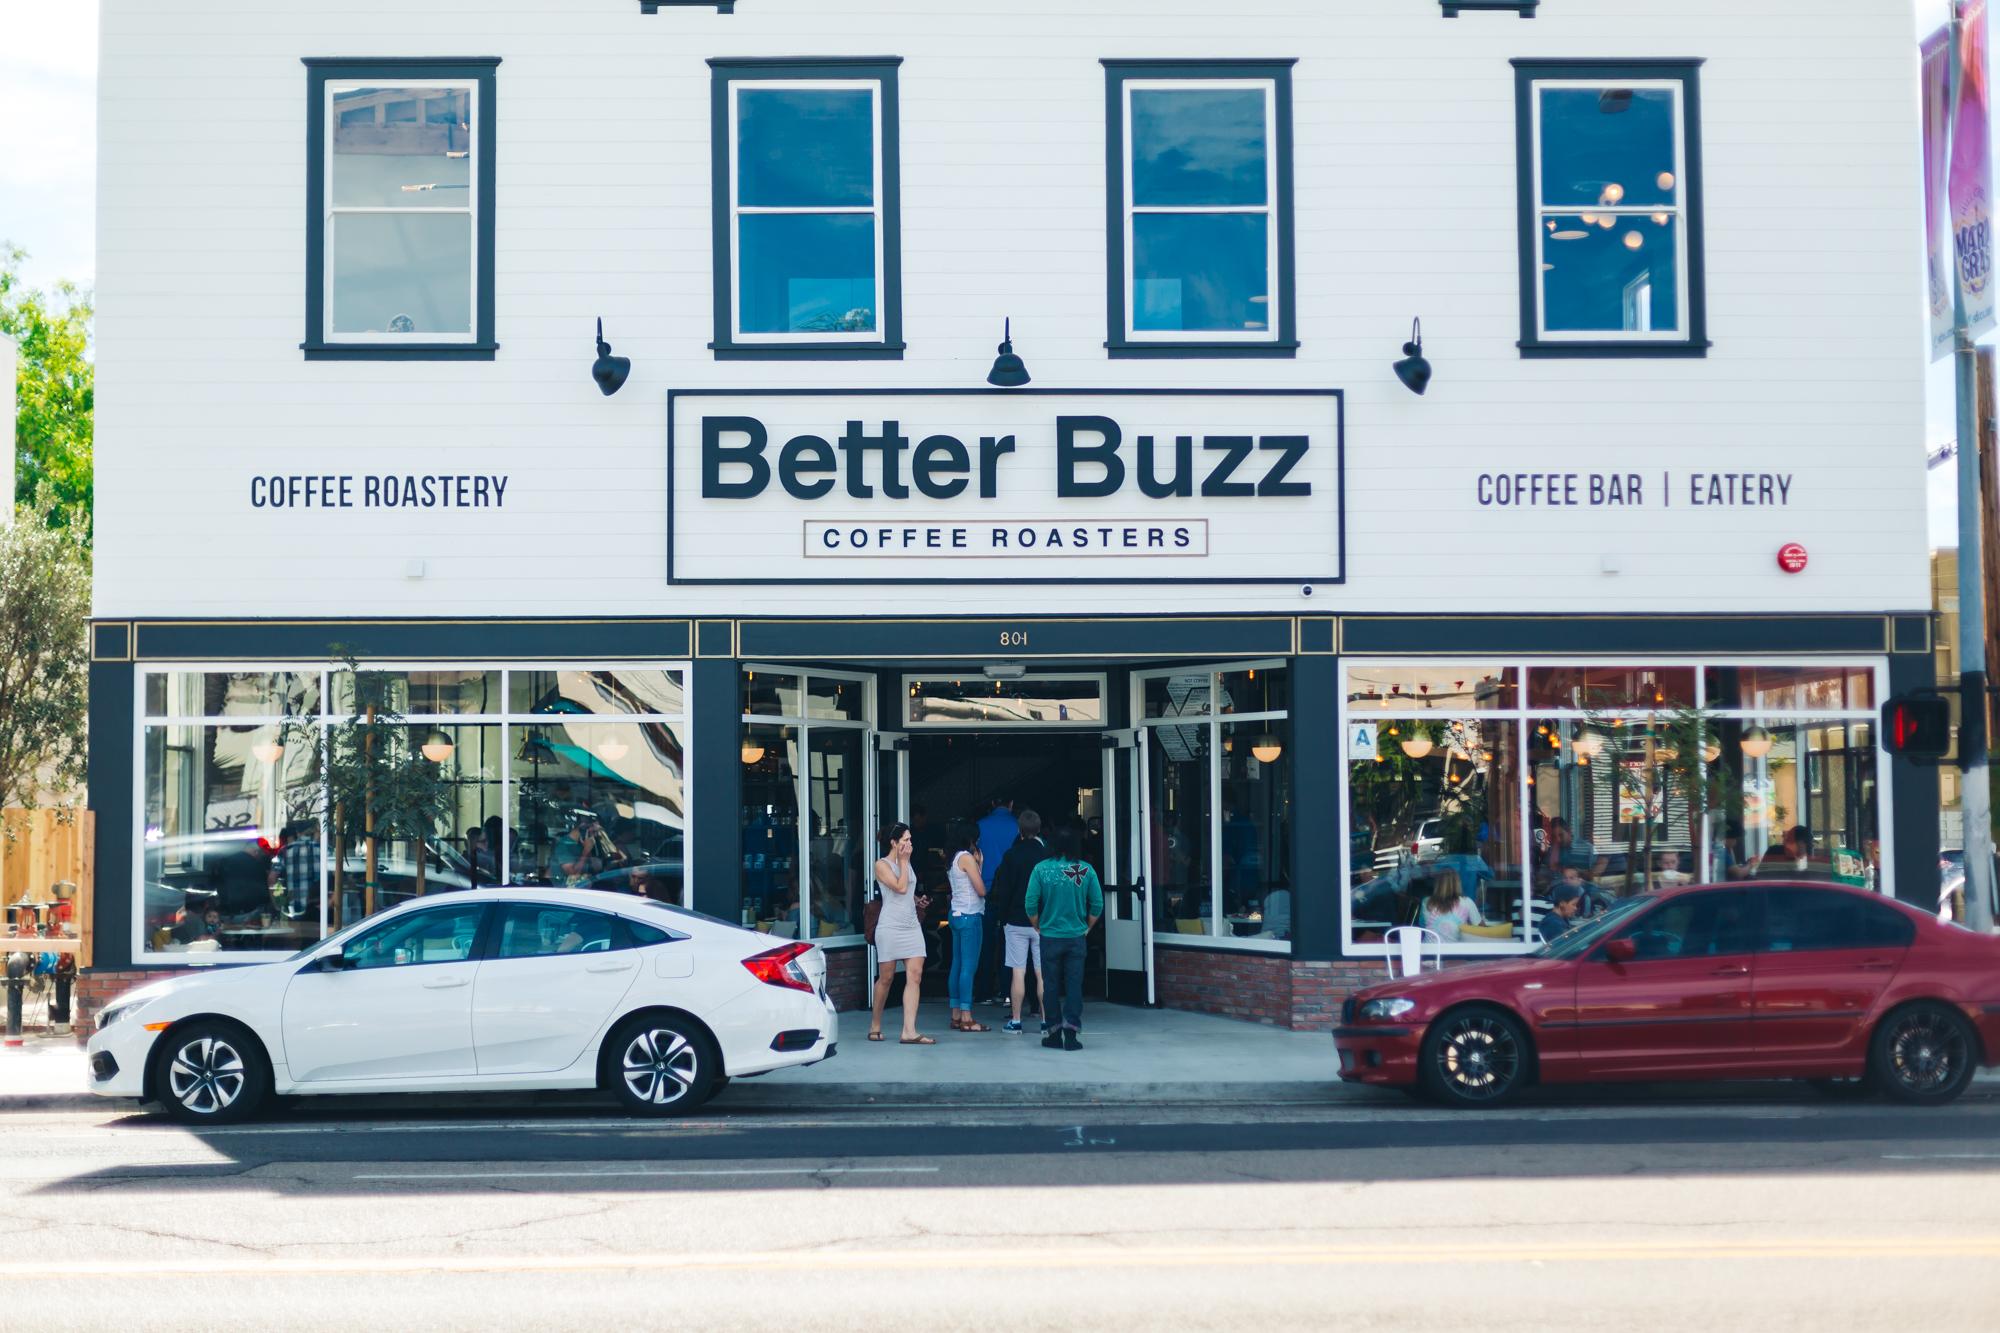 Better Buzz Coffee Hillcrest San Diego, california